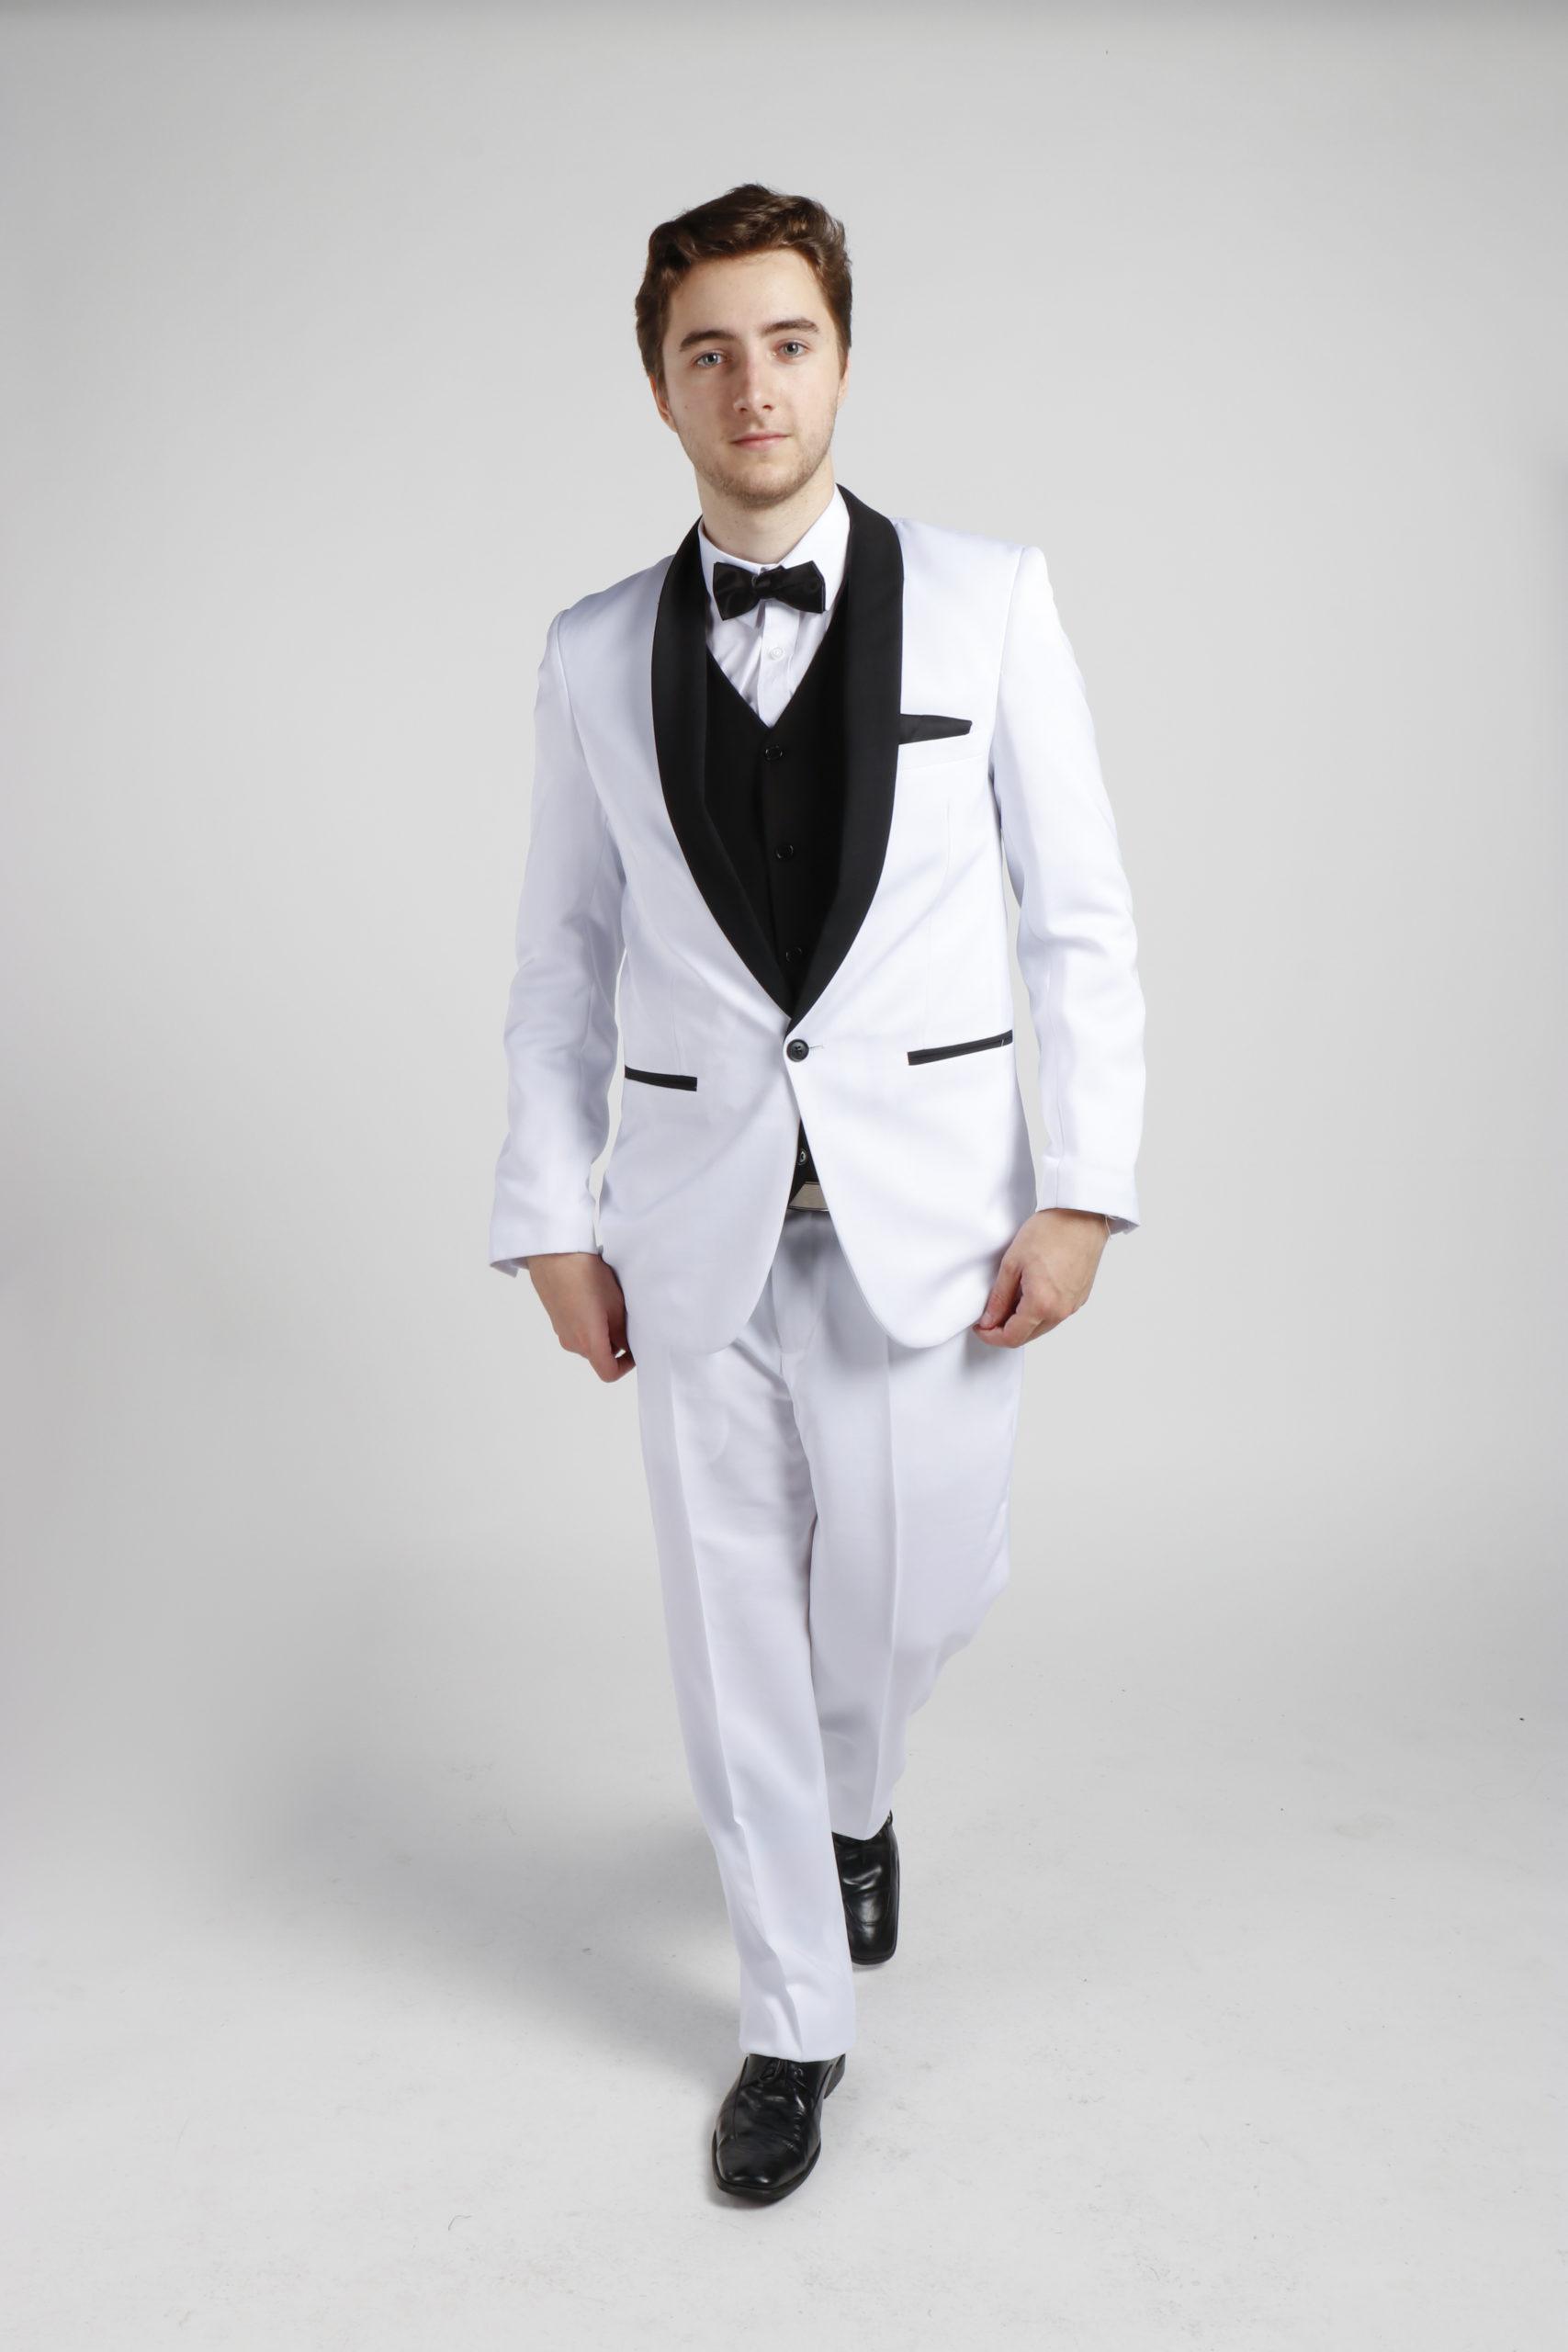 All White Tuxedo Hire